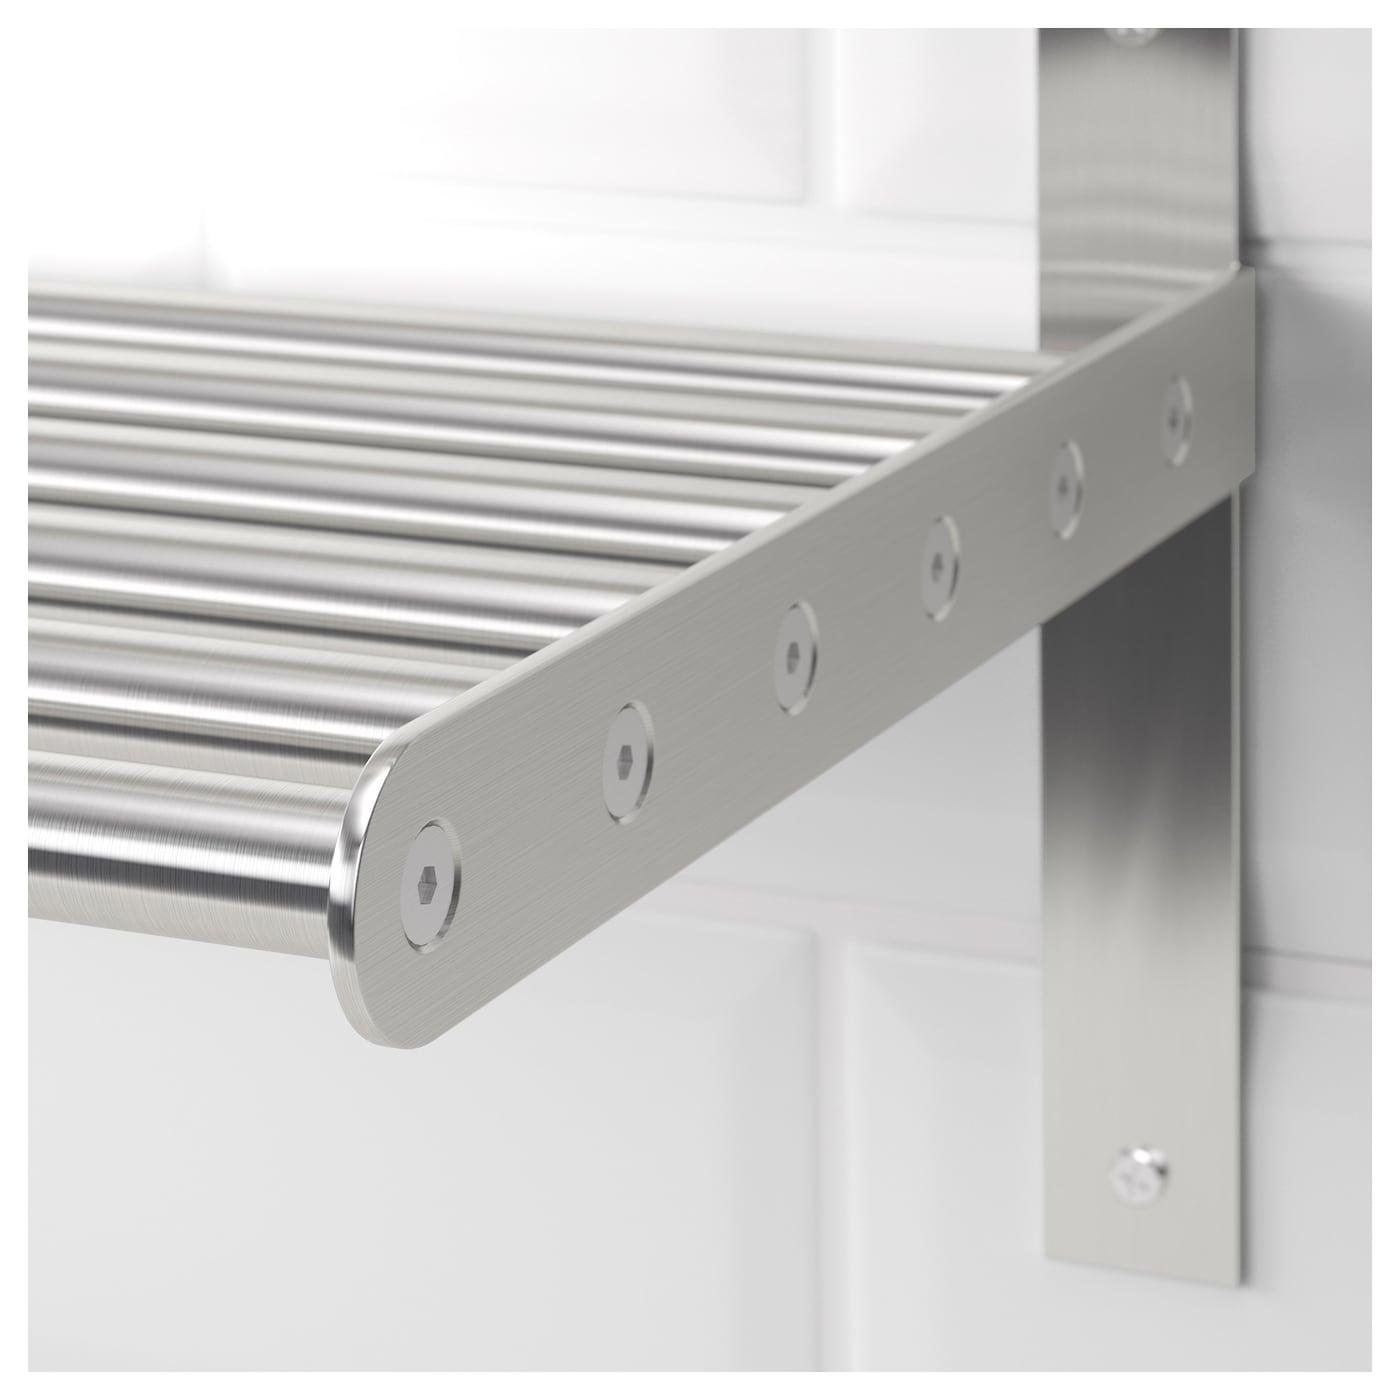 Used Ikea grundtal wall shelf stainless steel 80 cm - ikea